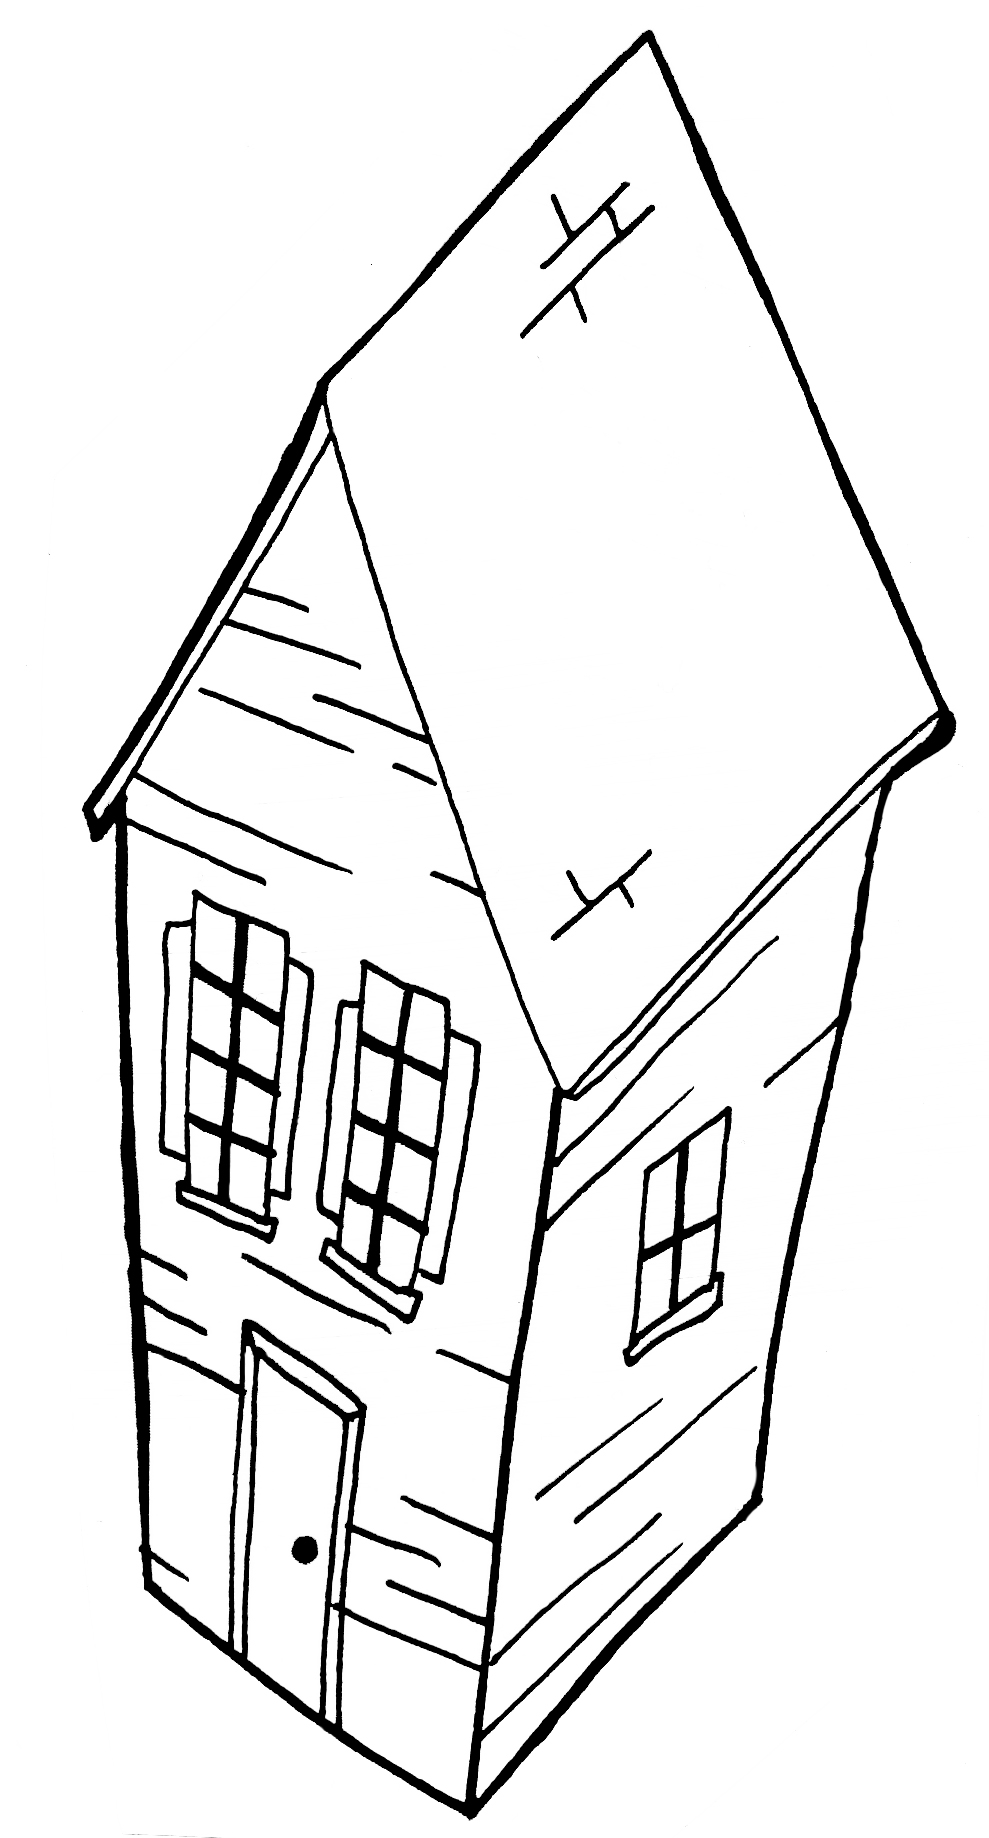 6_house1_line_6x3.jpg